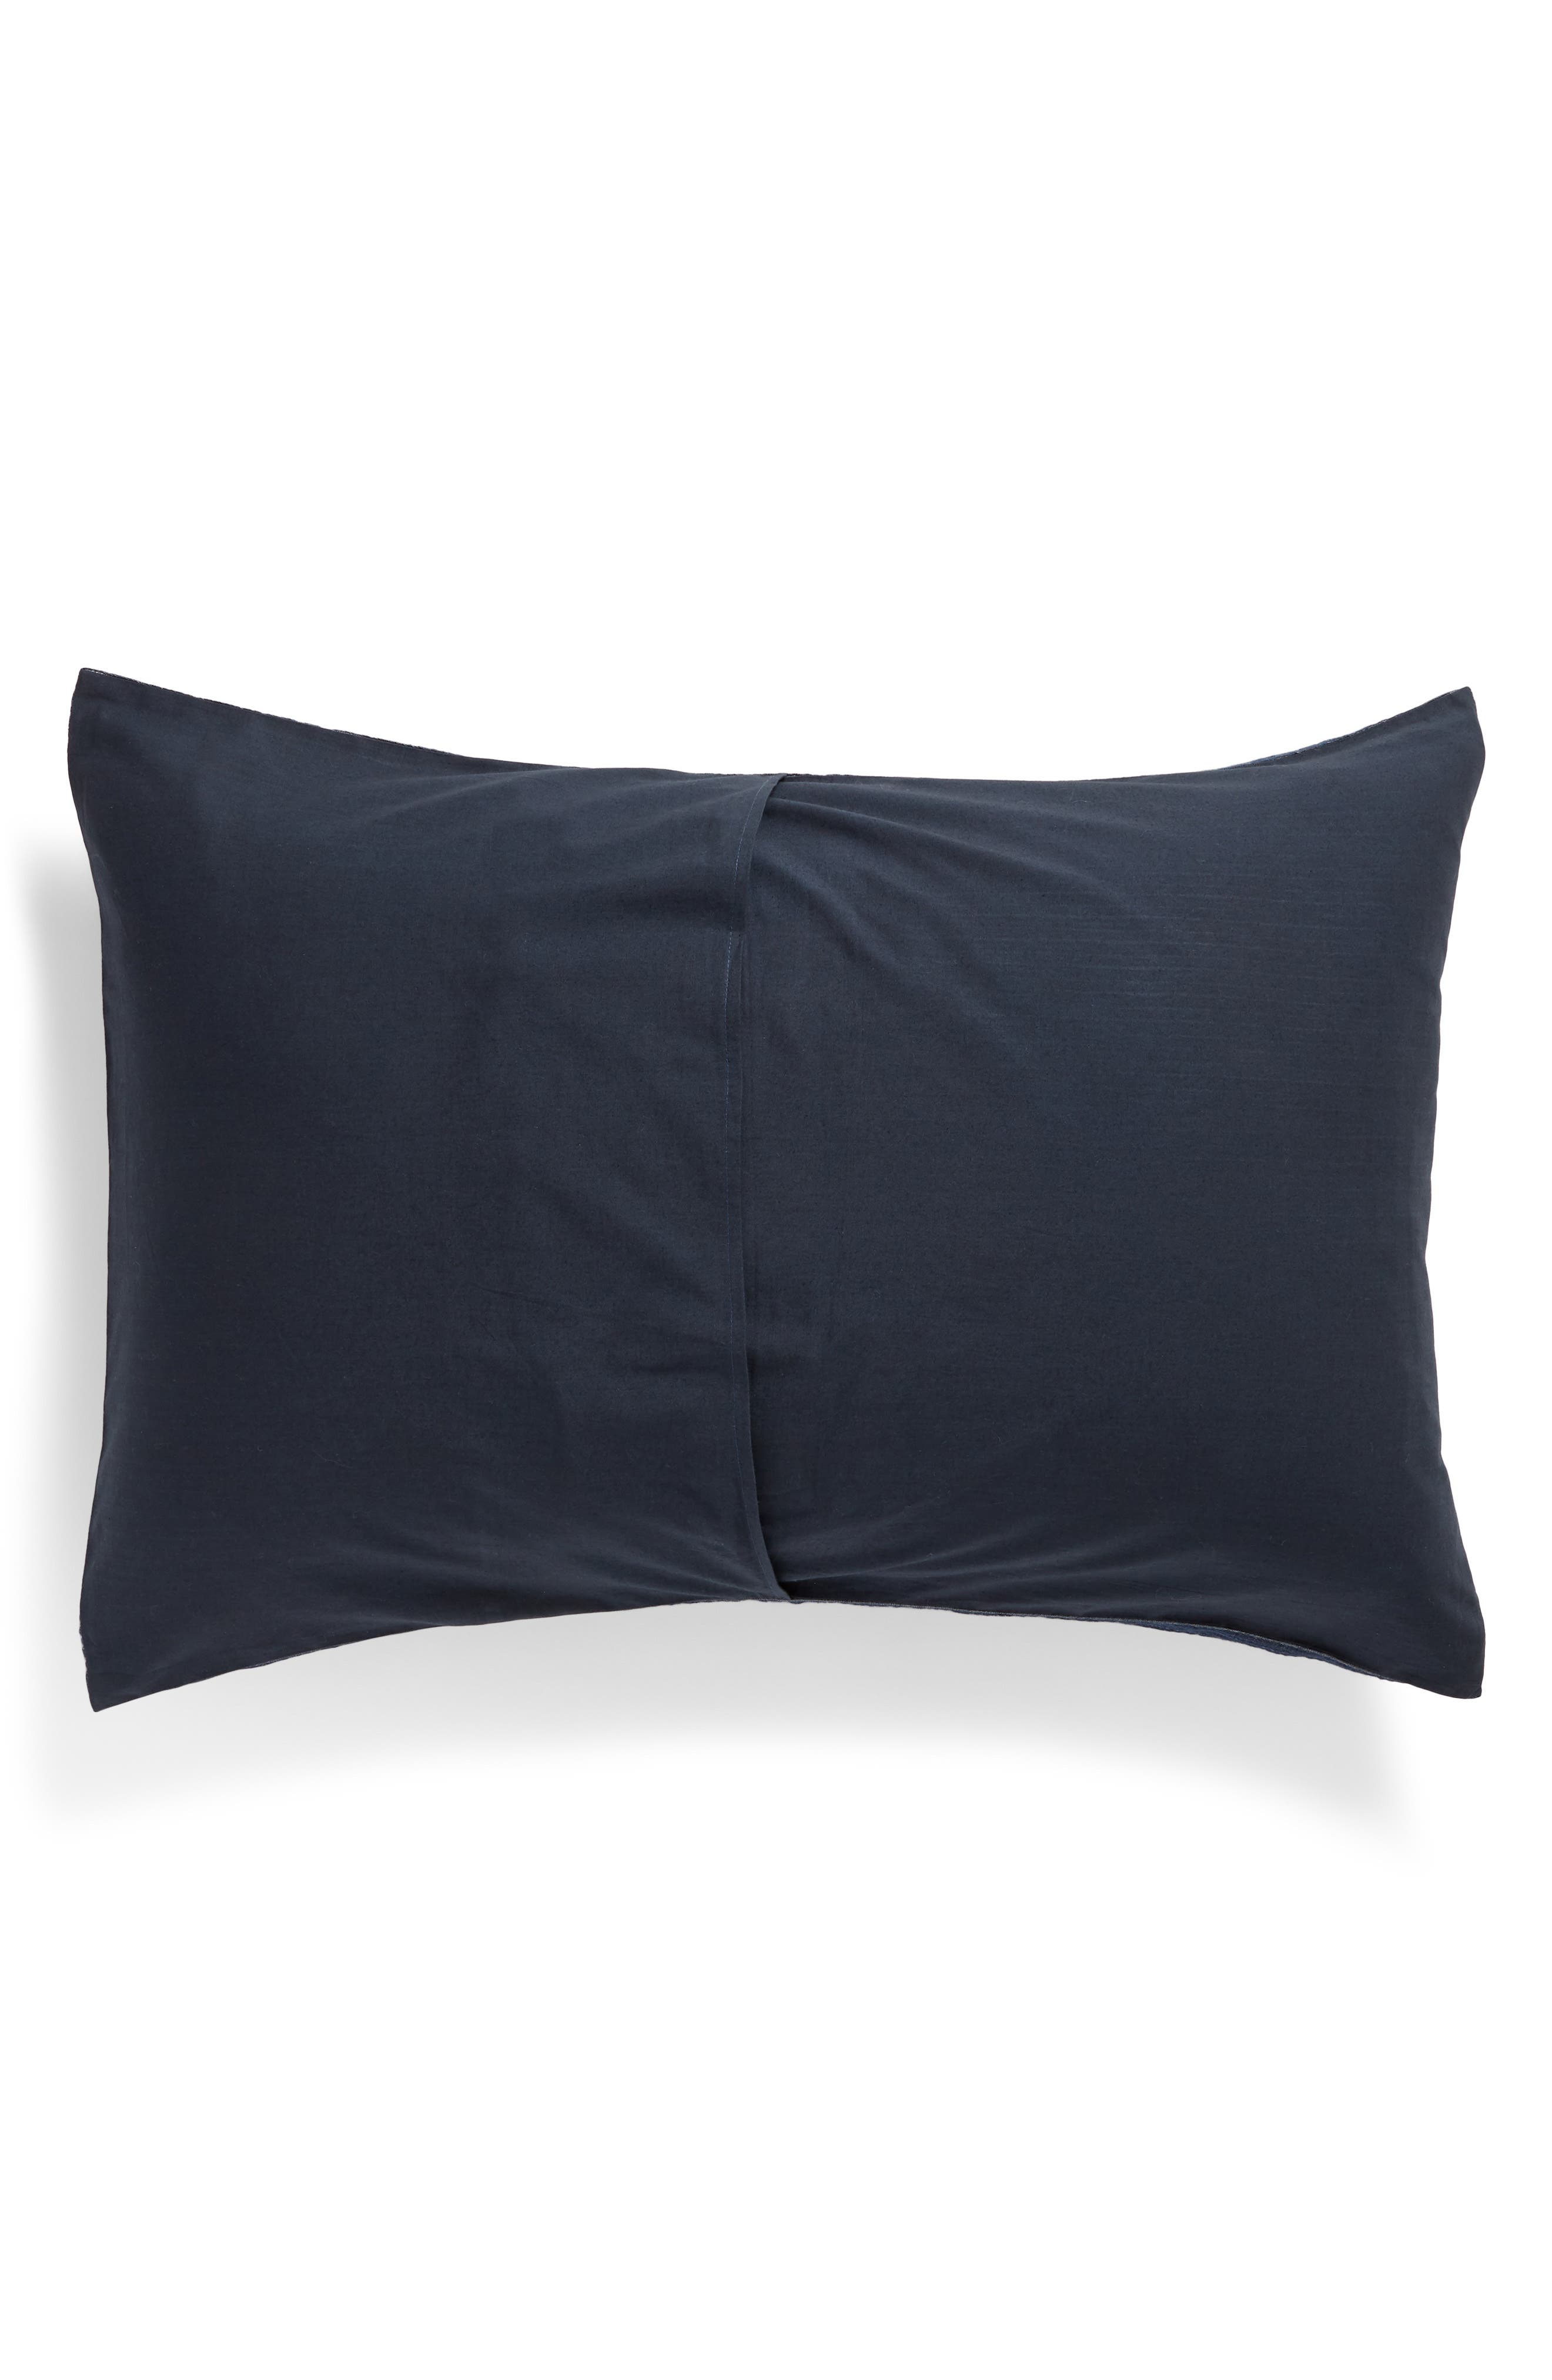 TREASURE & BOND, Stripe Texture Sham, Alternate thumbnail 2, color, NAVY BLUE